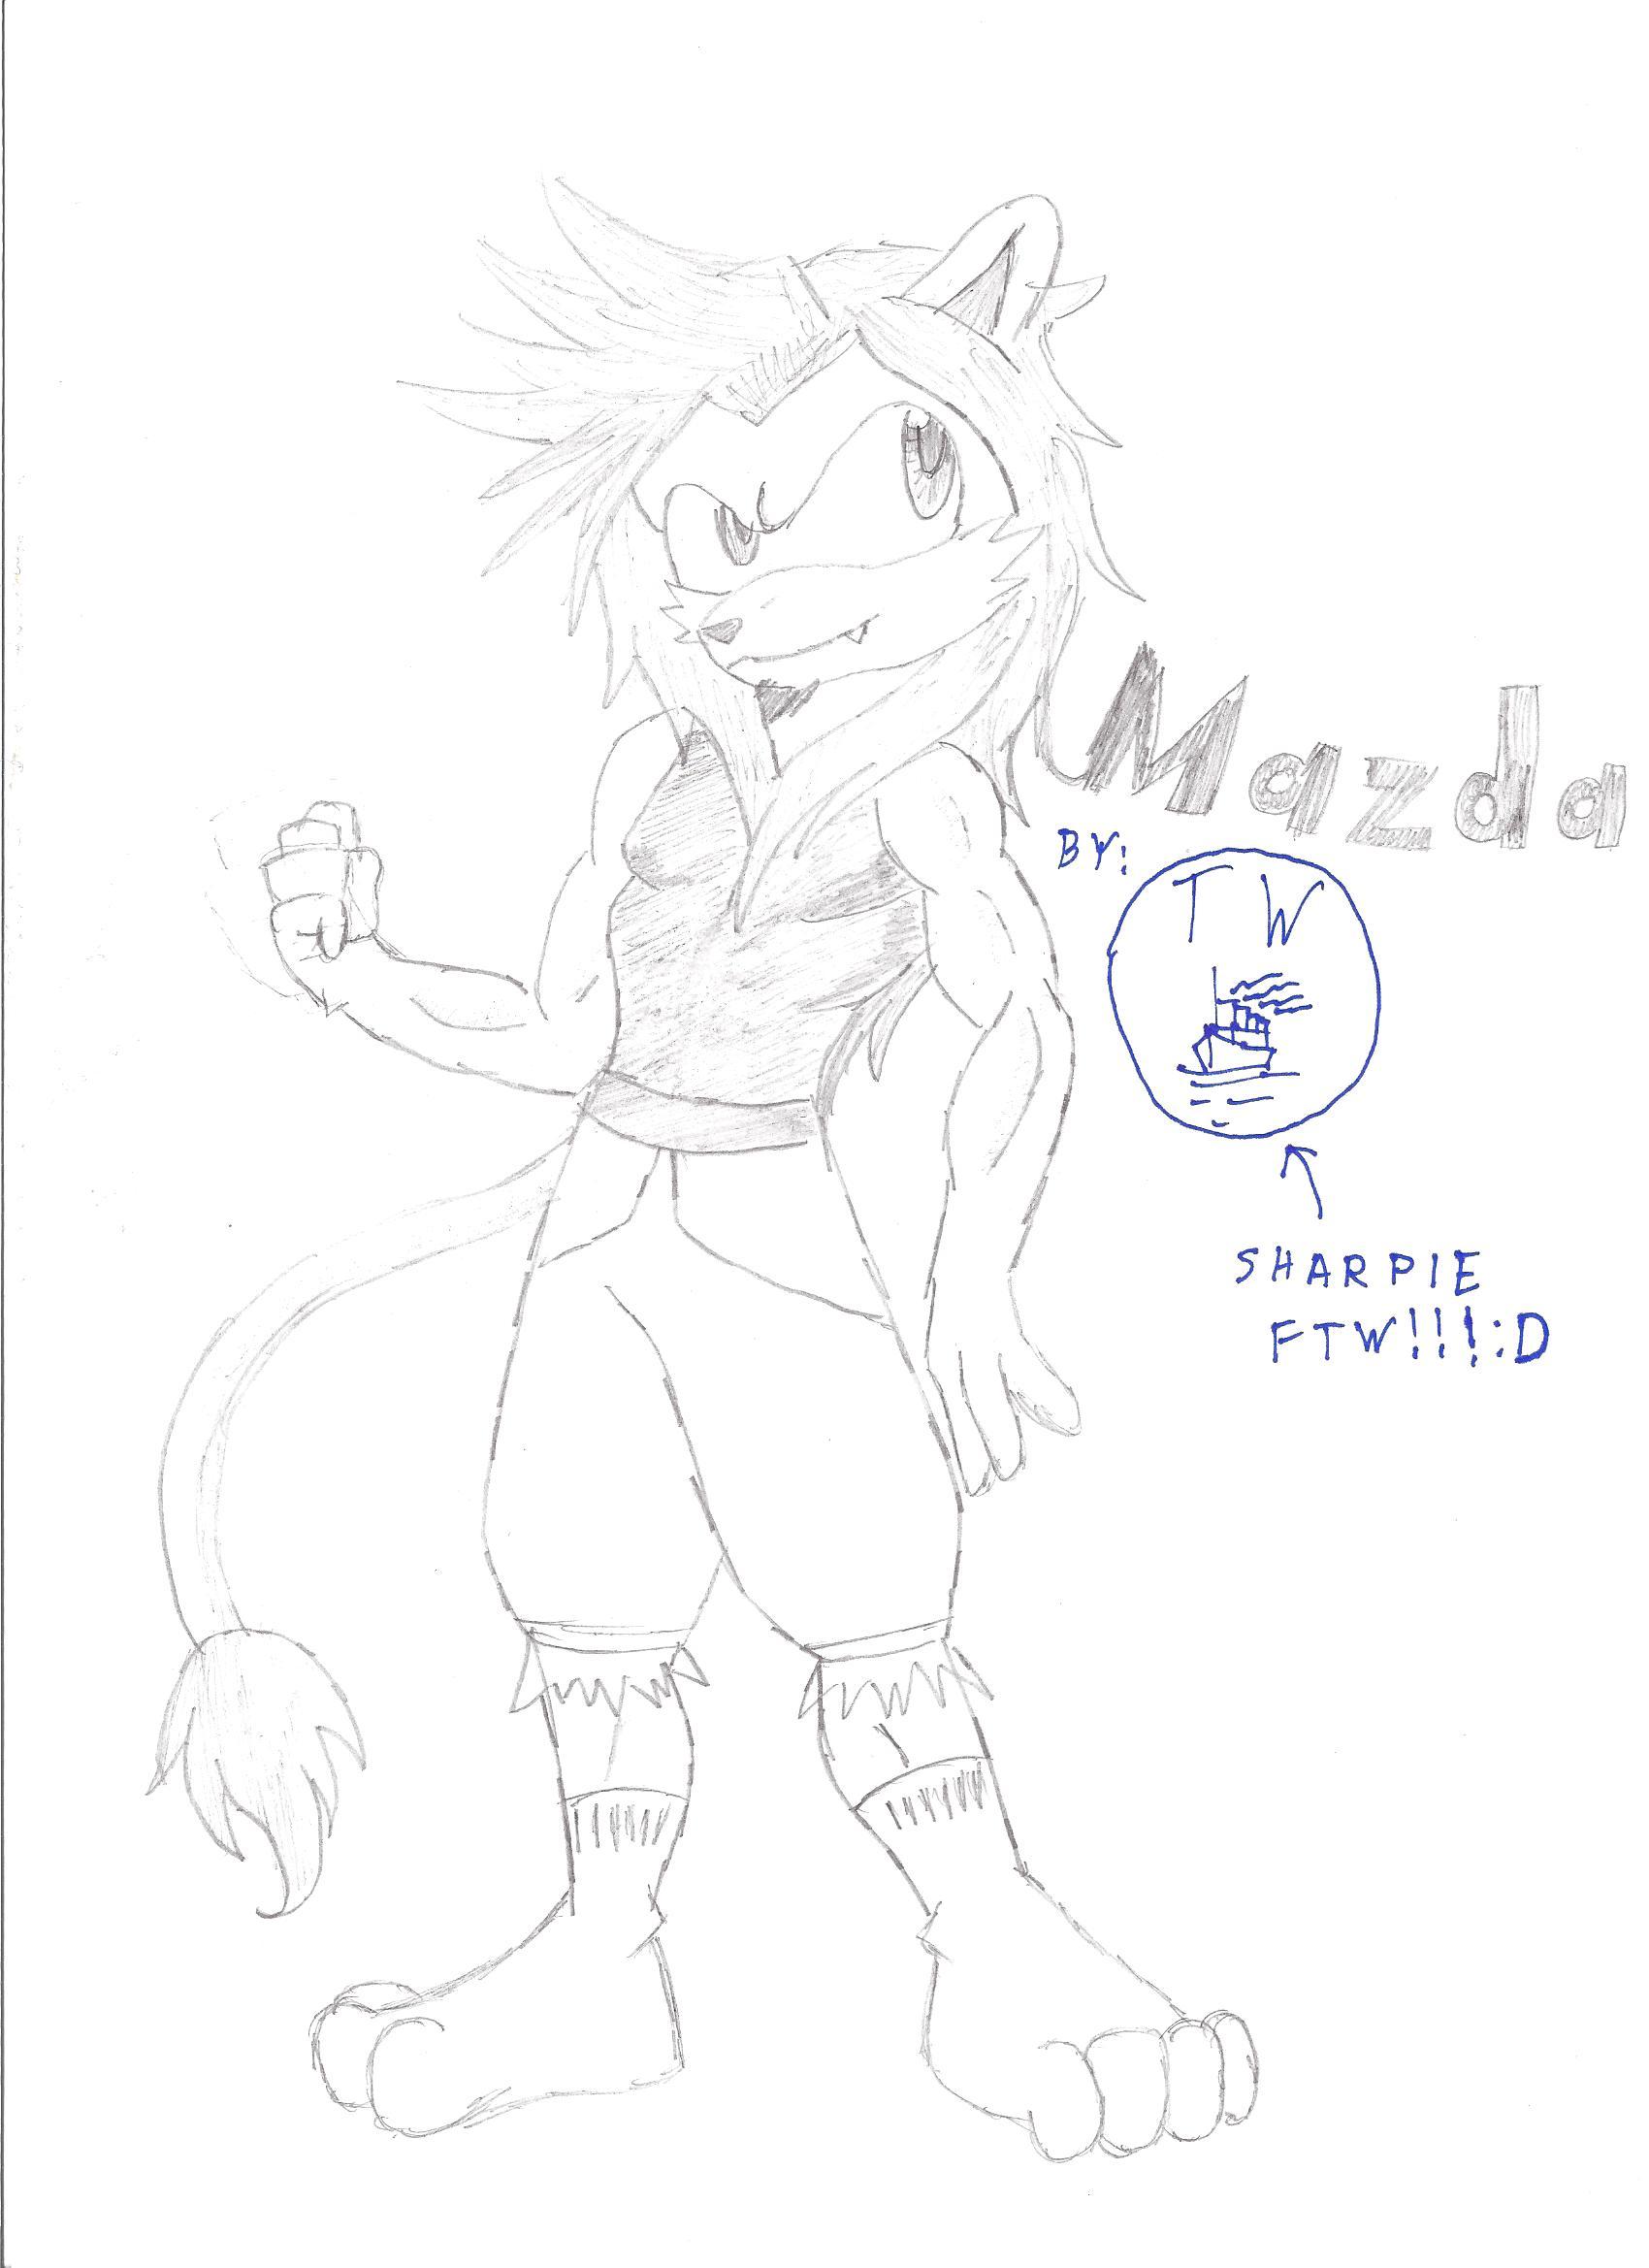 Mazda the Lion